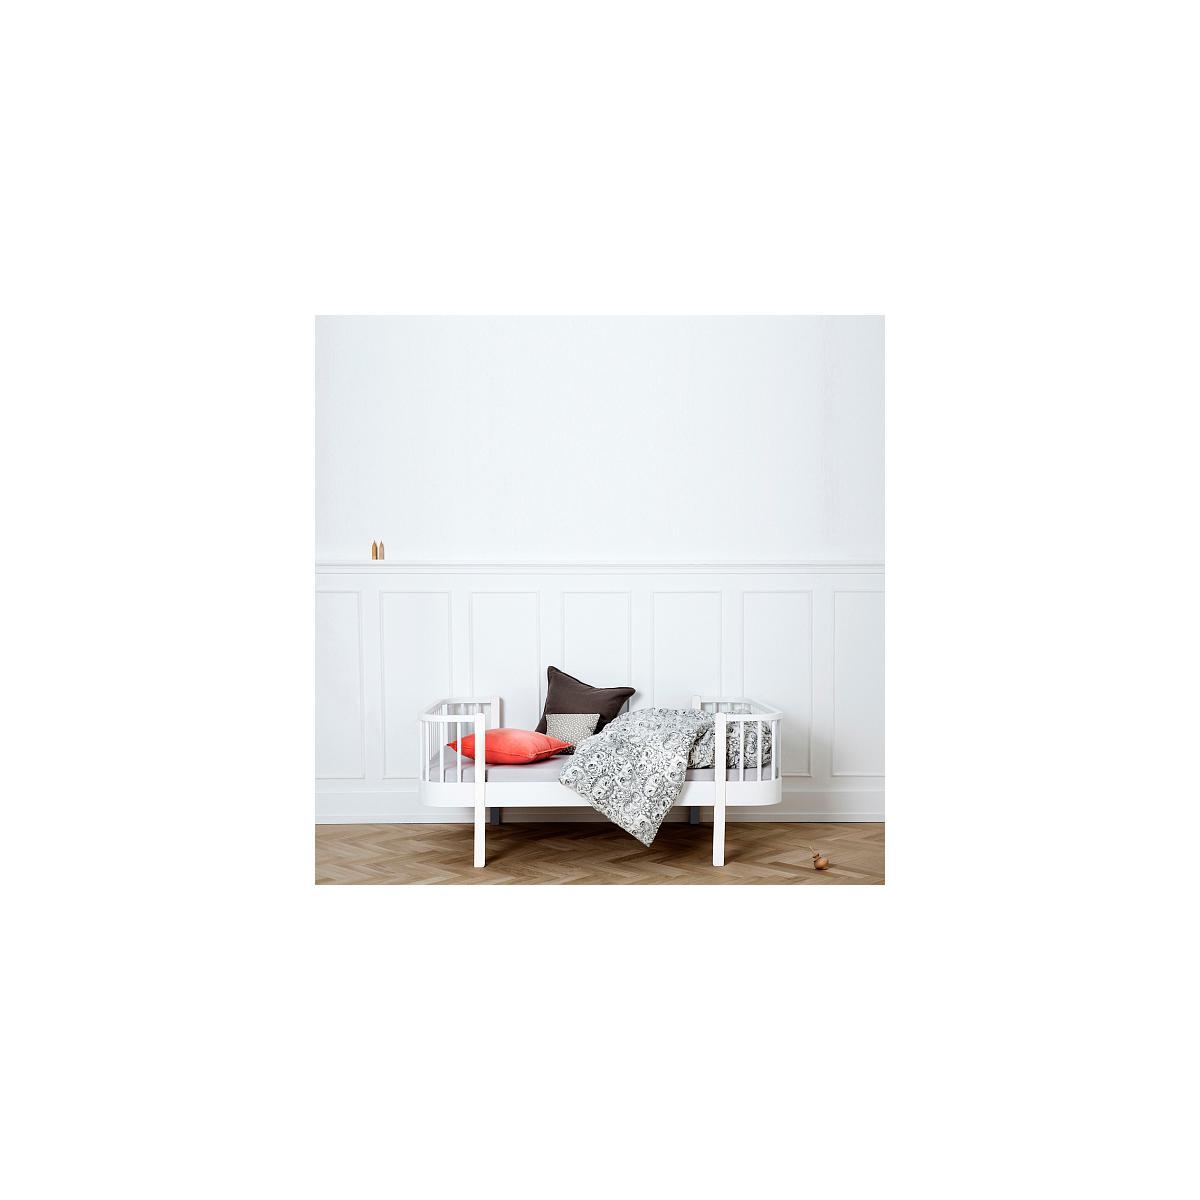 Lit bas évolutif 90x160cm WOOD Oliver Furniture blanc